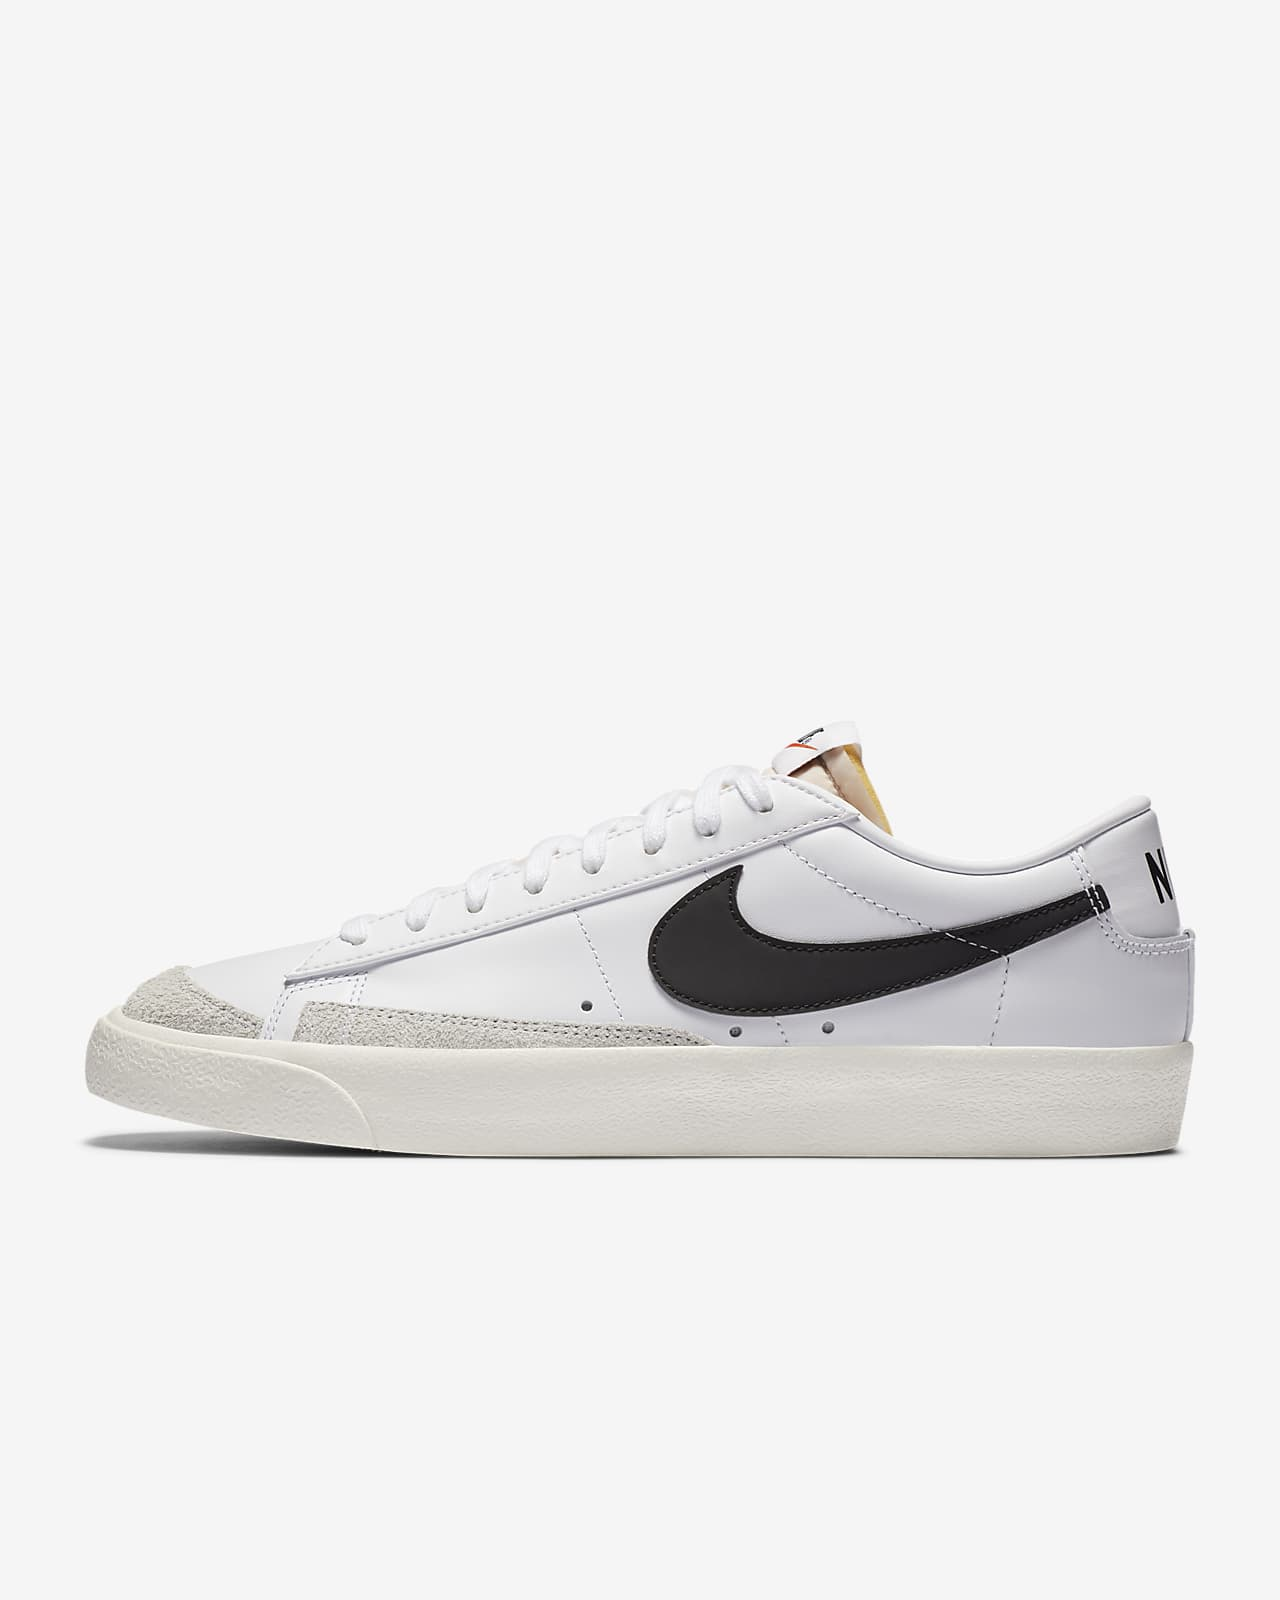 Chaussure Nike Blazer Low '77 Vintage pour Homme